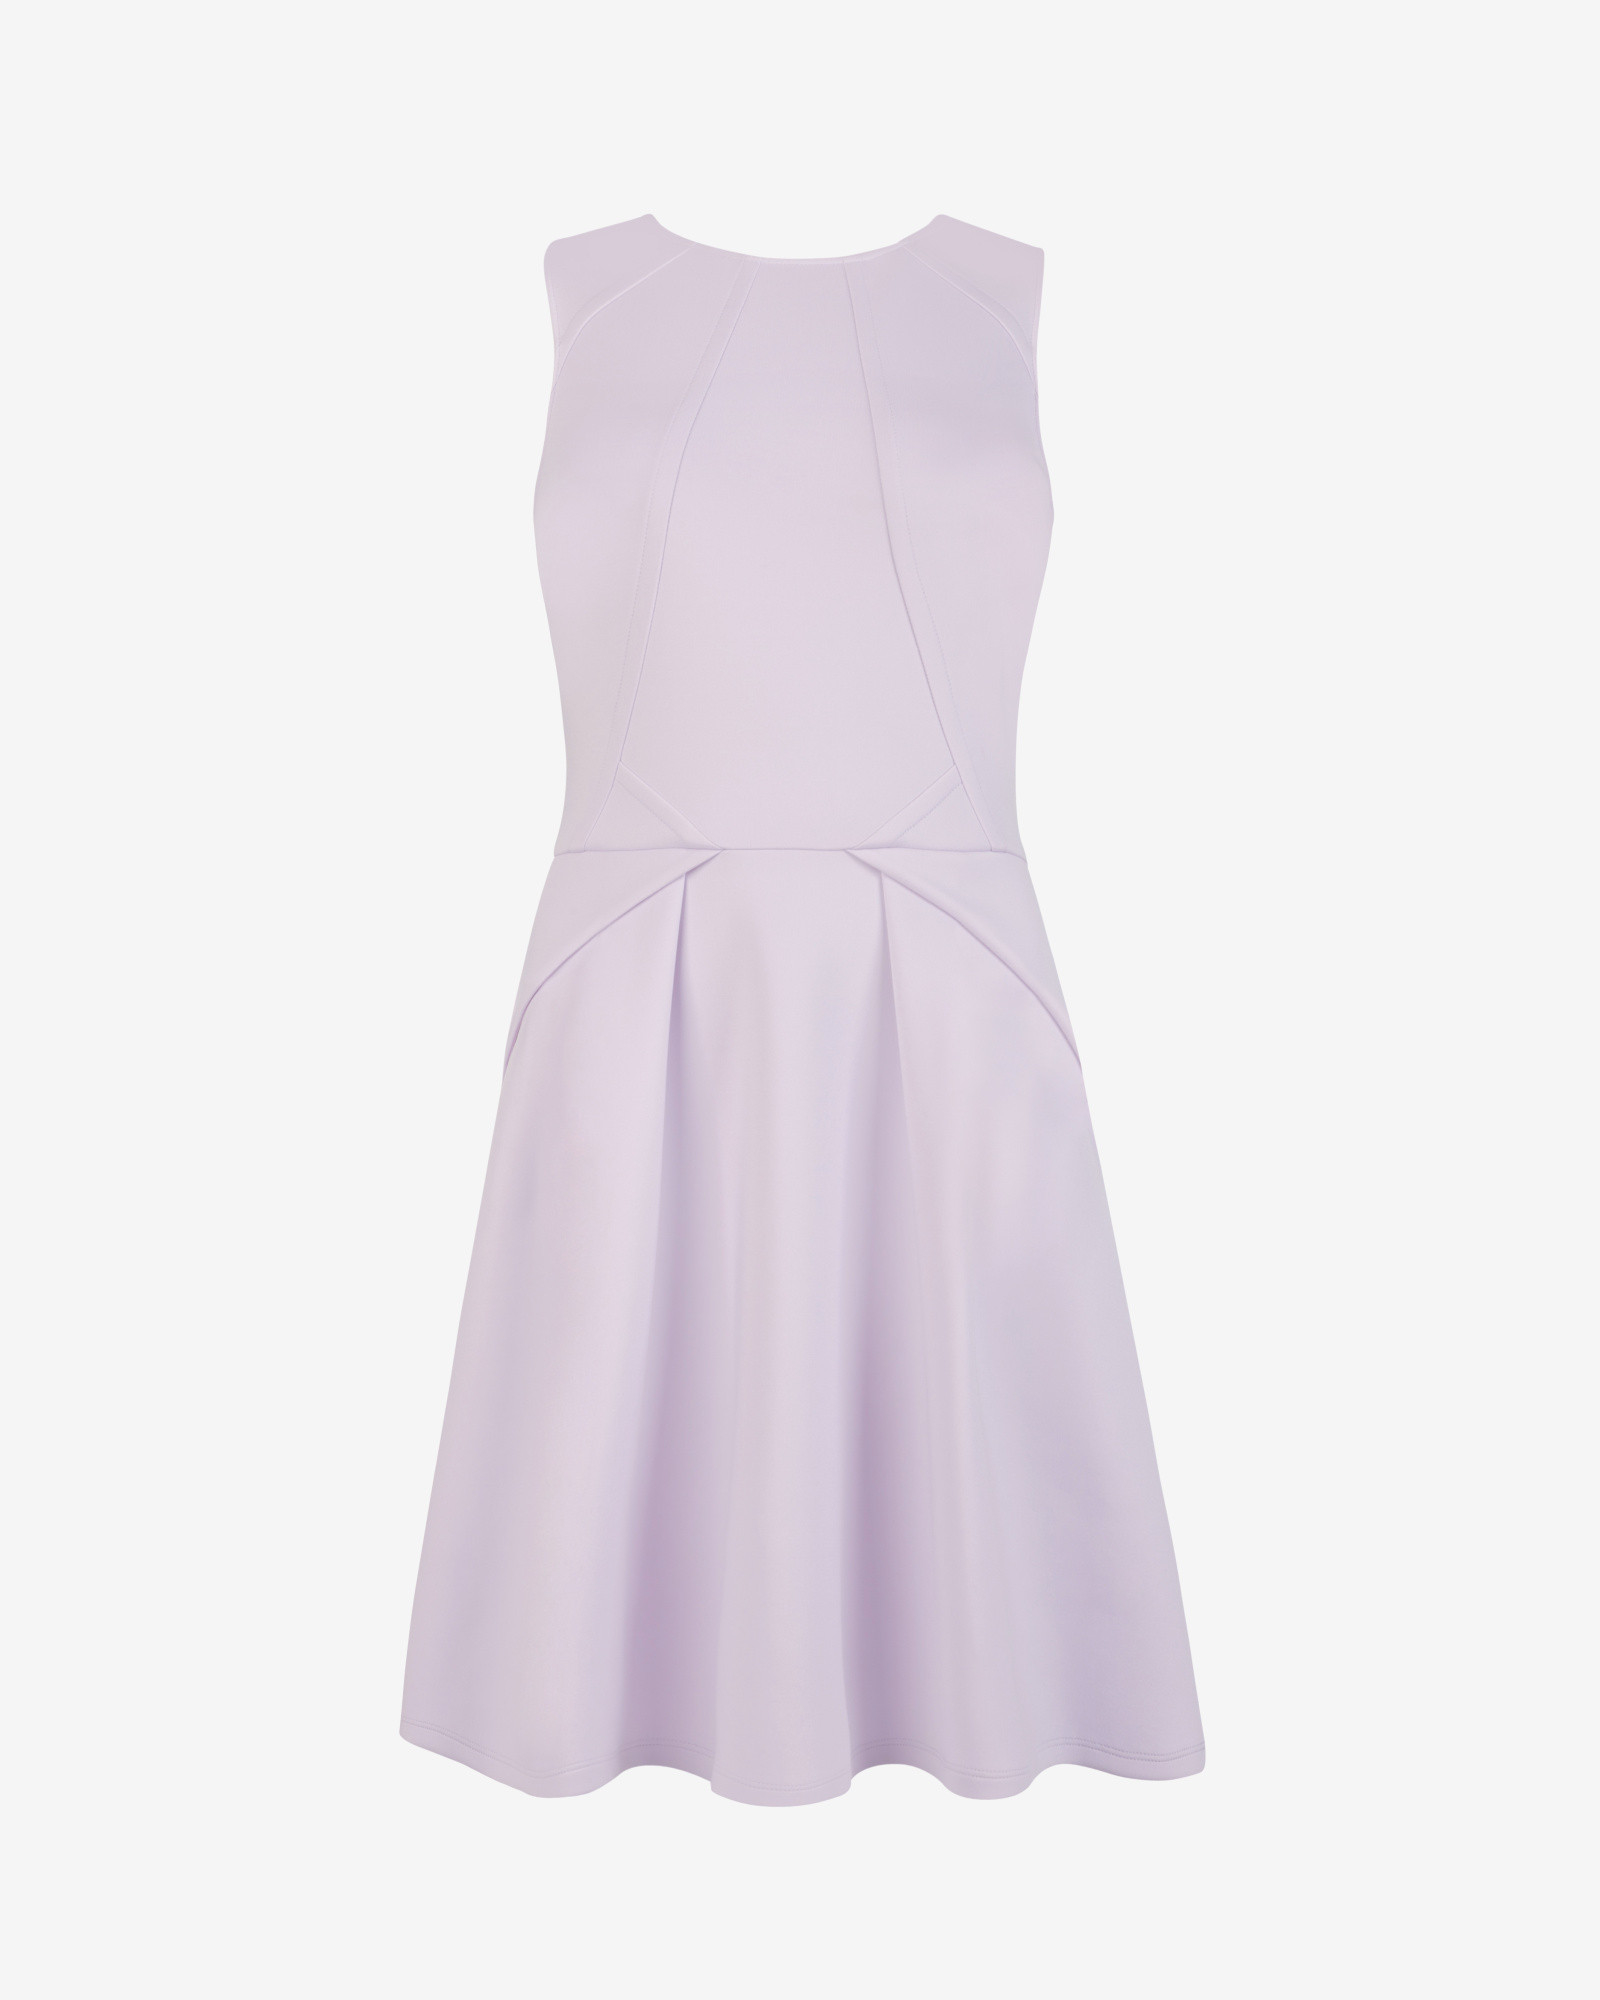 4618bb7852 Gallery. Women s Purple Dresses Women s Skater Dresses Women s Pink ...